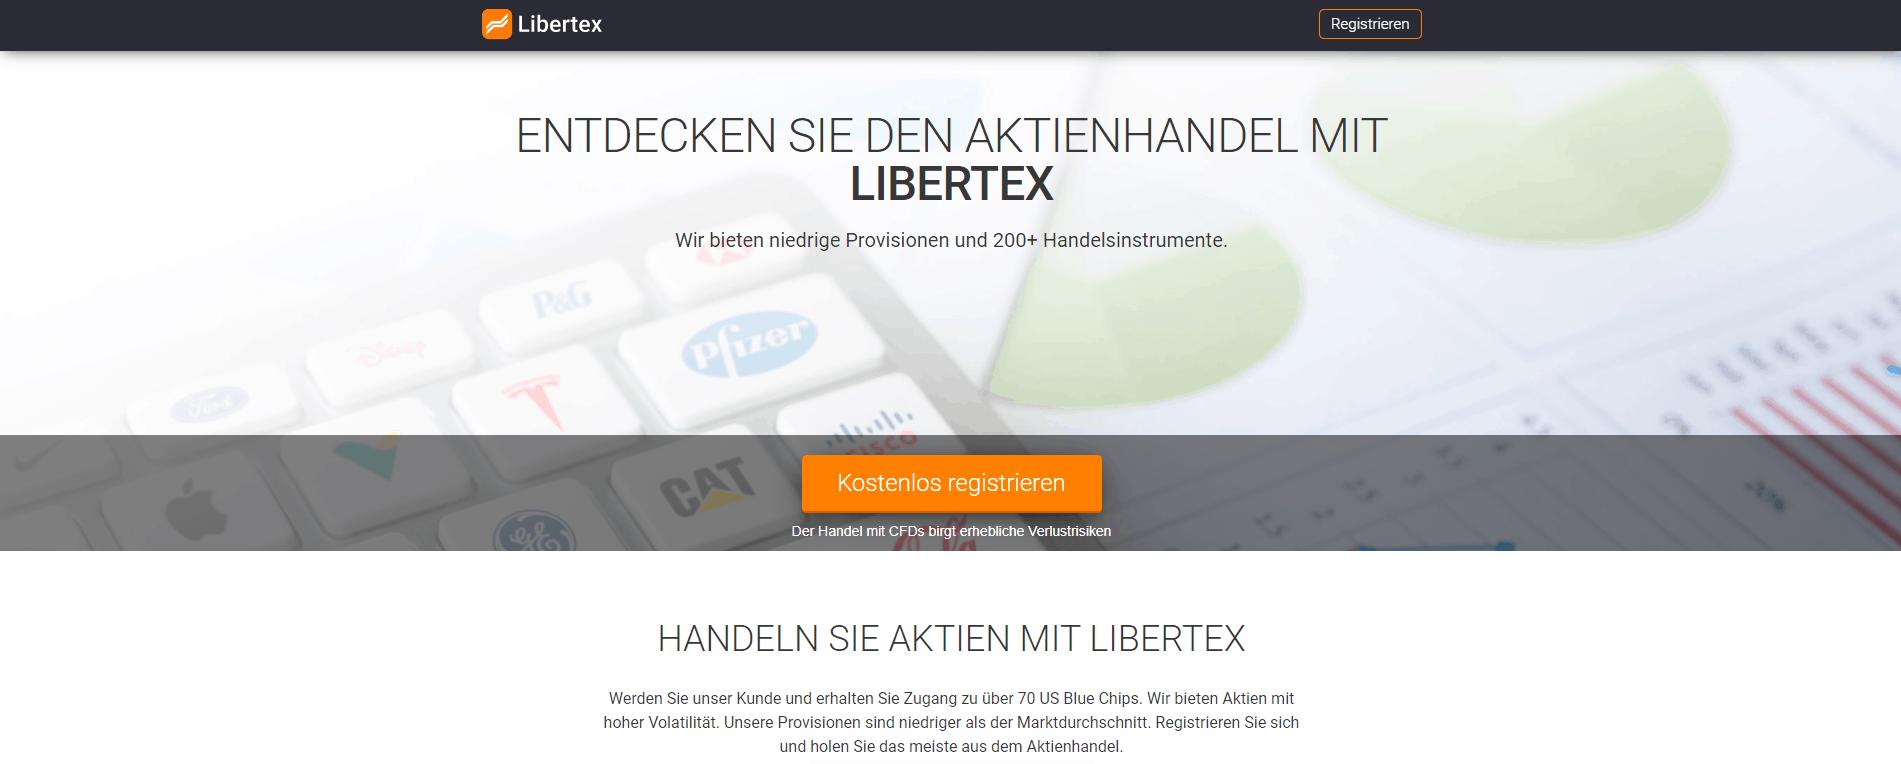 Libertex